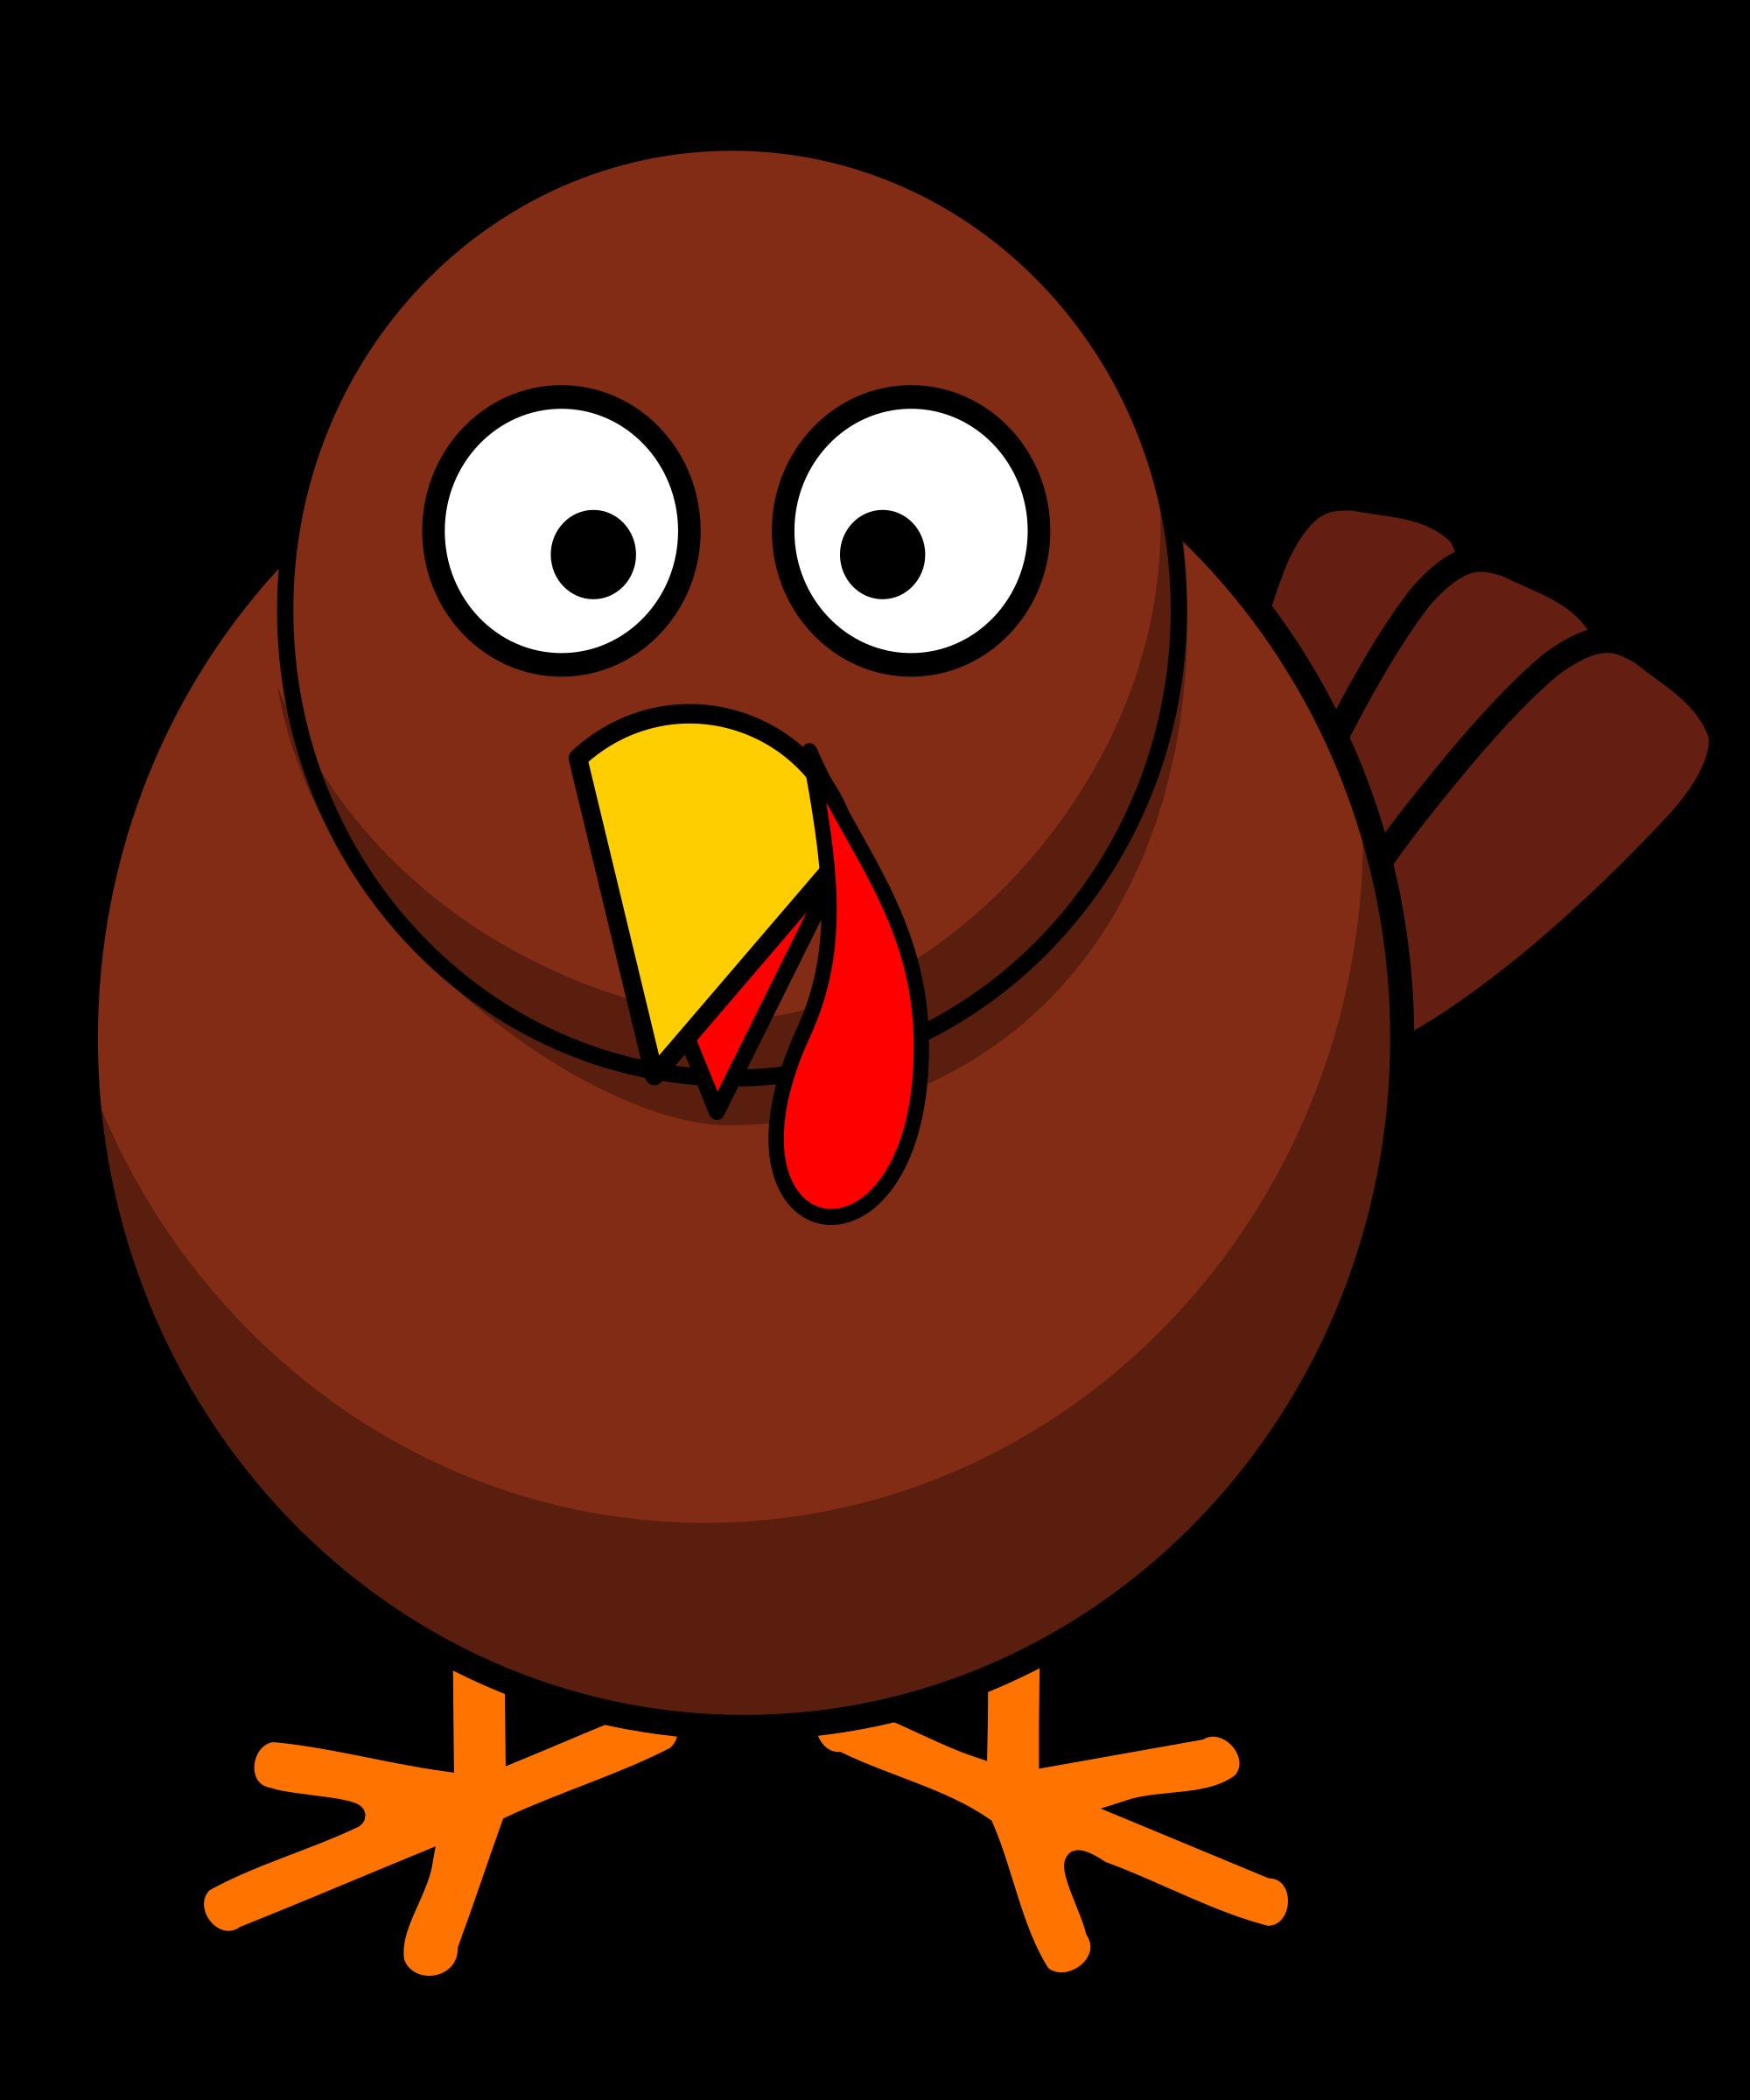 Clipart face big bird. Turkey round cartoon image